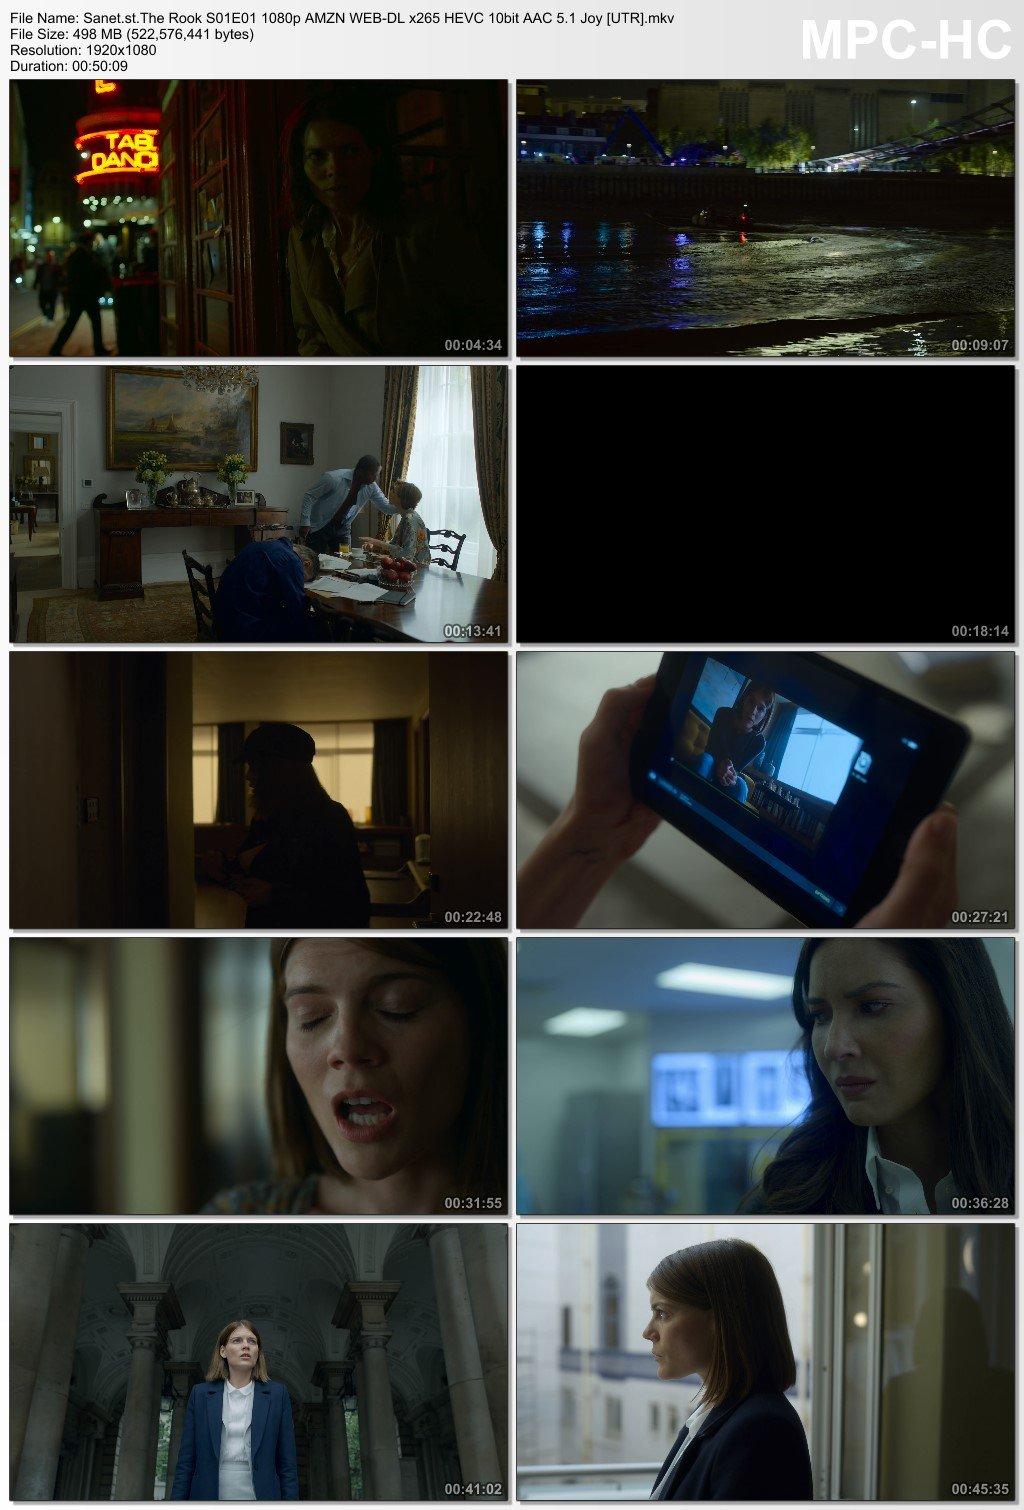 Download The Rook S01E01 1080p AMZN WEB-DL x265 HEVC 10bit AAC 5 1